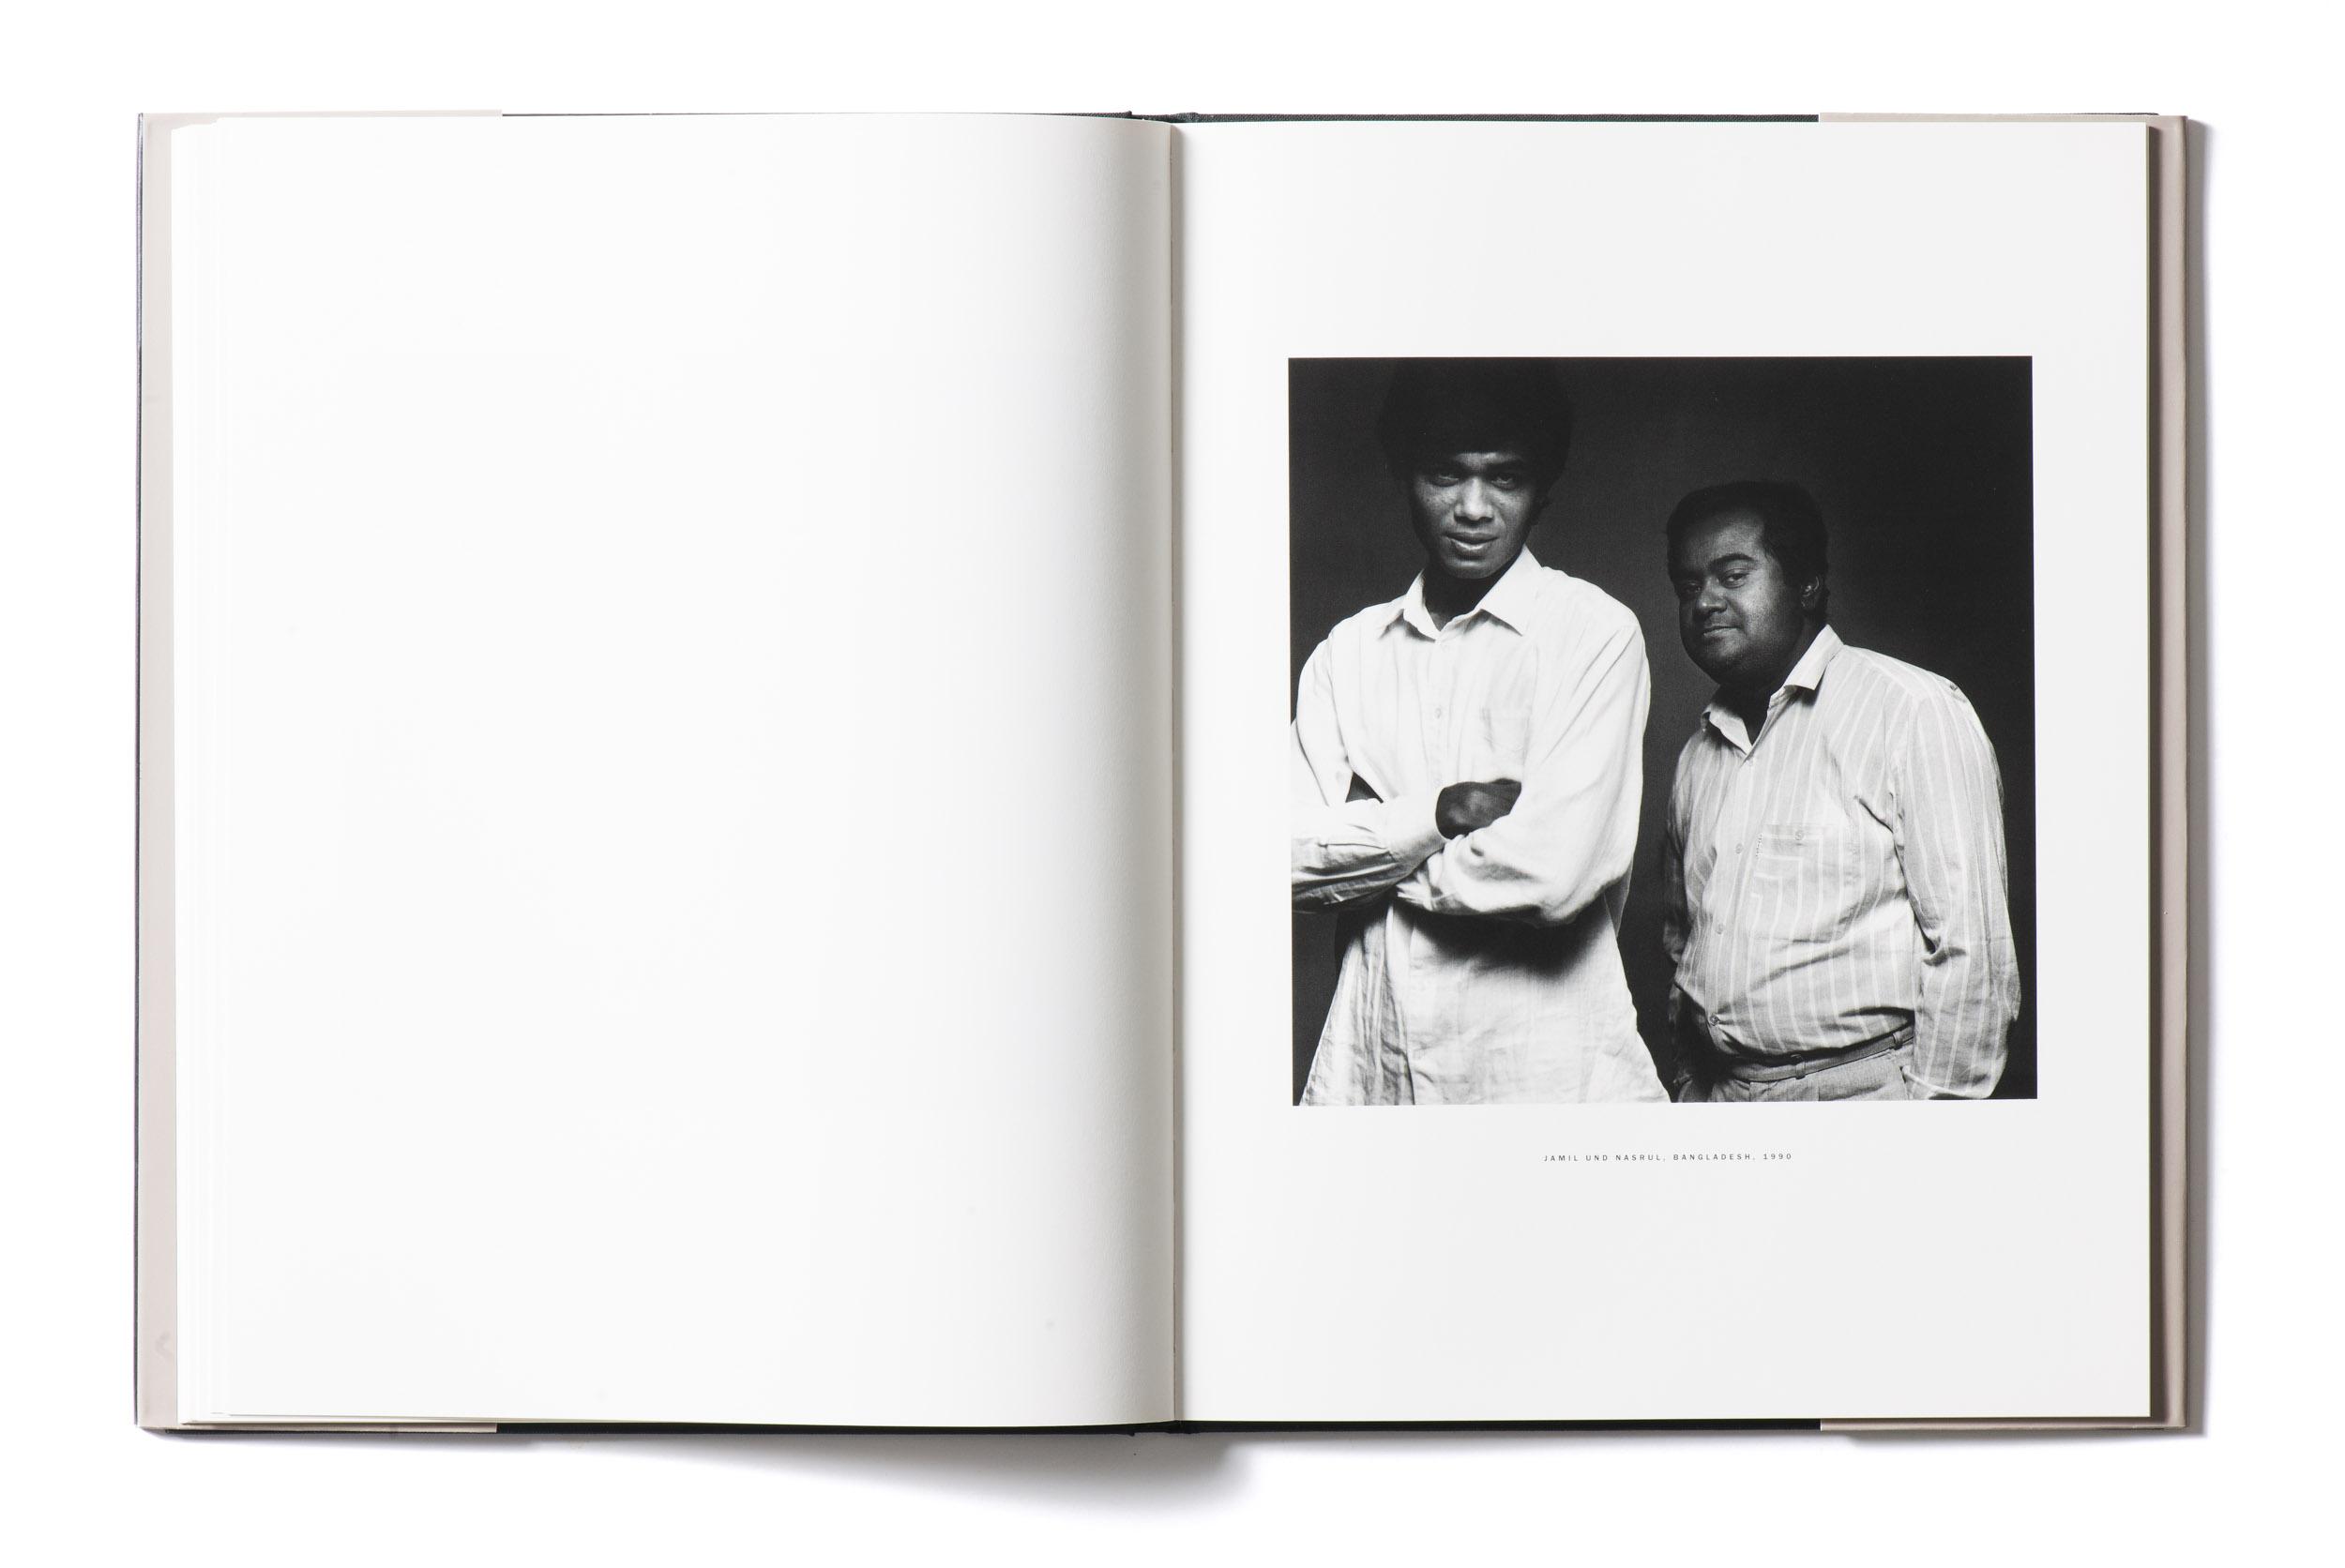 Kunstband Fotografien Peter Hebeisen Titel Feindbilder #6